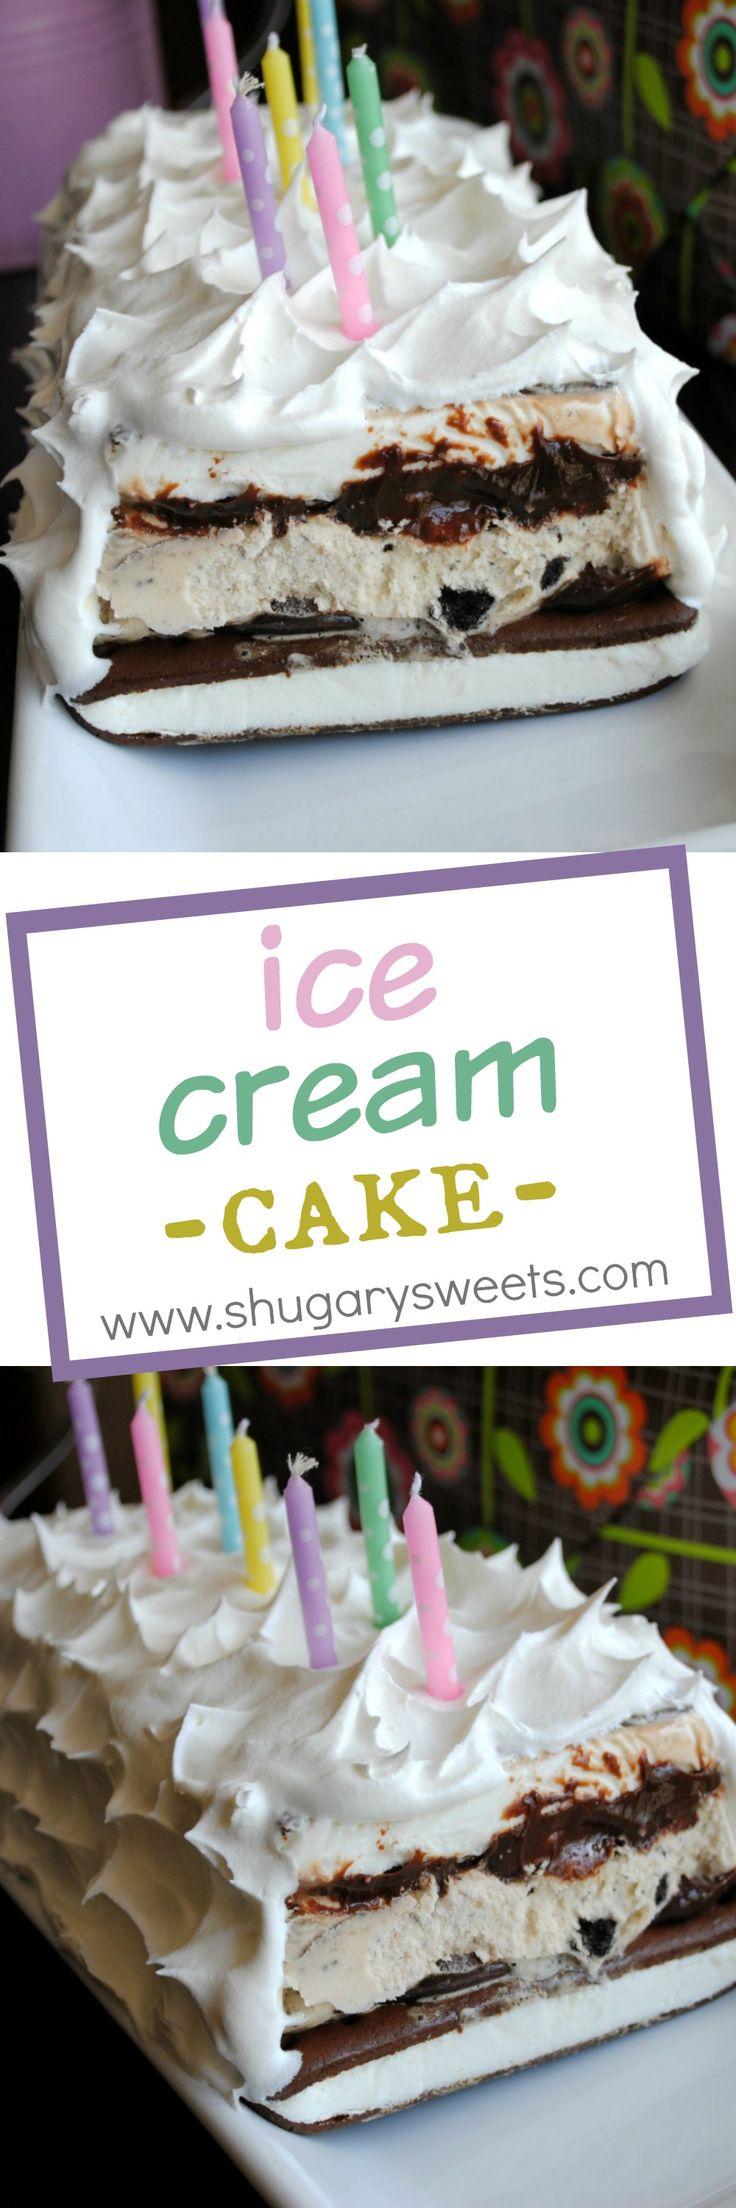 Ice Cream Cake: easy cake made from ice cream sandwiches, hot fudge and whipped cream!